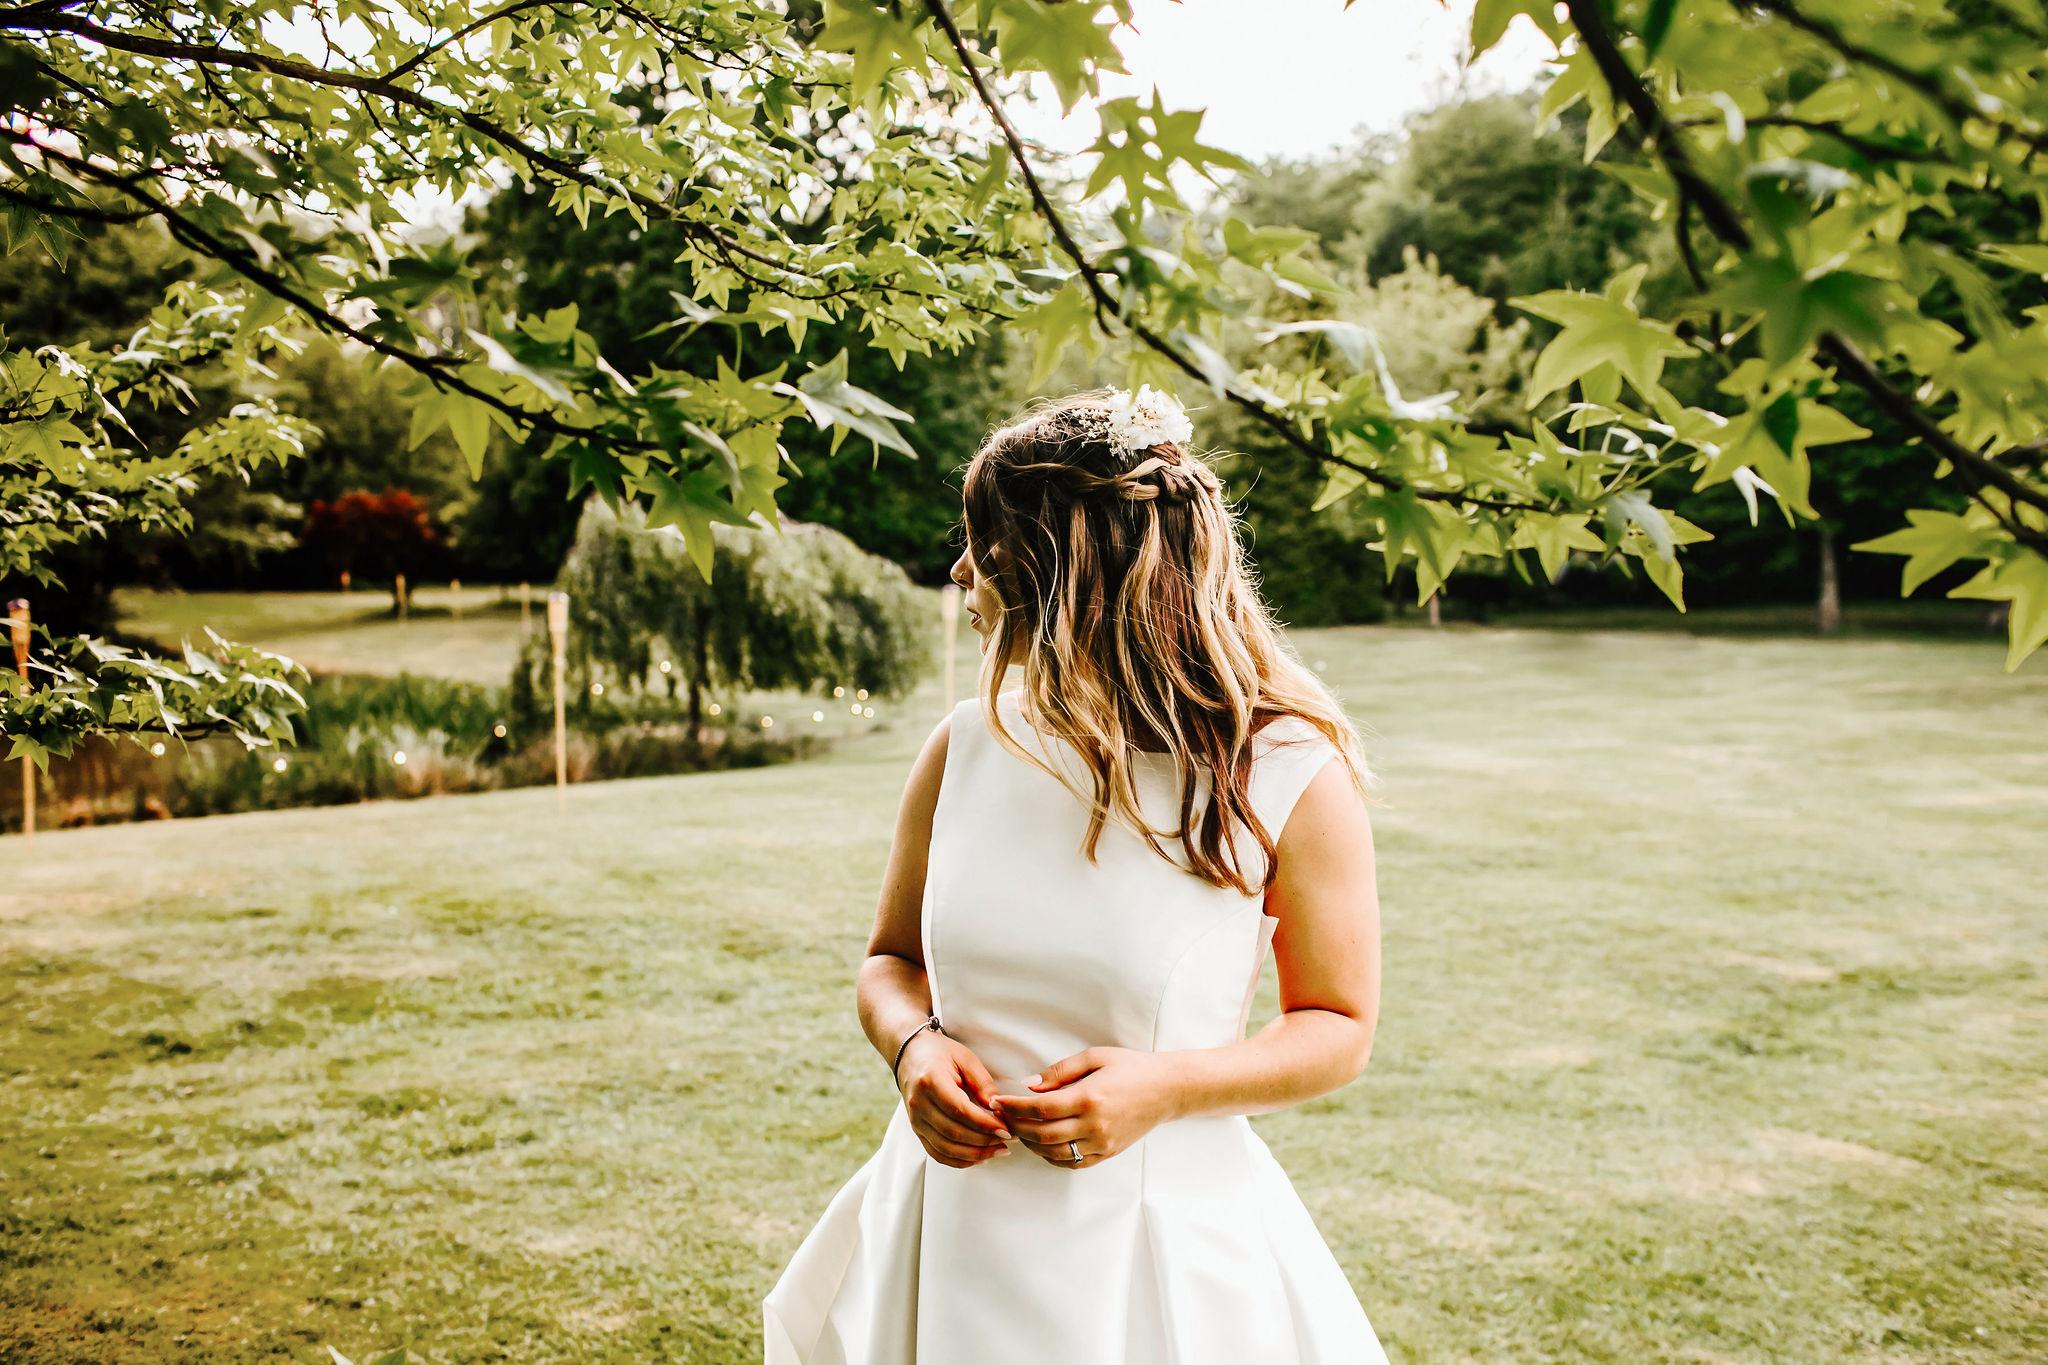 fiesta-fields-louisa-thomas-blog-bride-4-abigailwhite.jpg